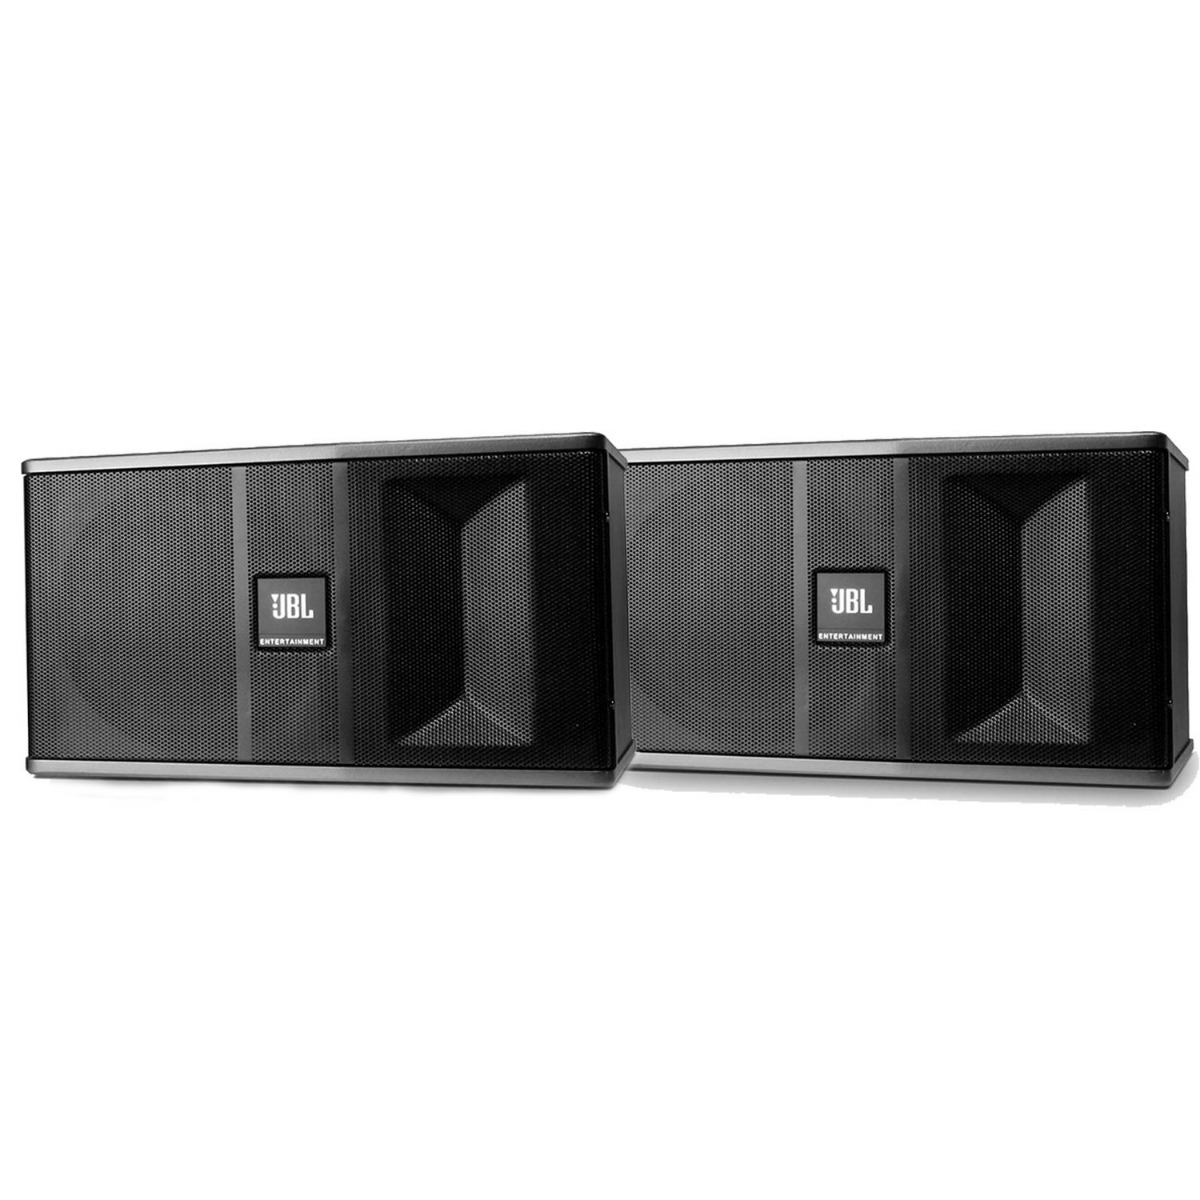 Caixa Acústica Passiva Woofer JBL Ki08 Pak 150W RMS